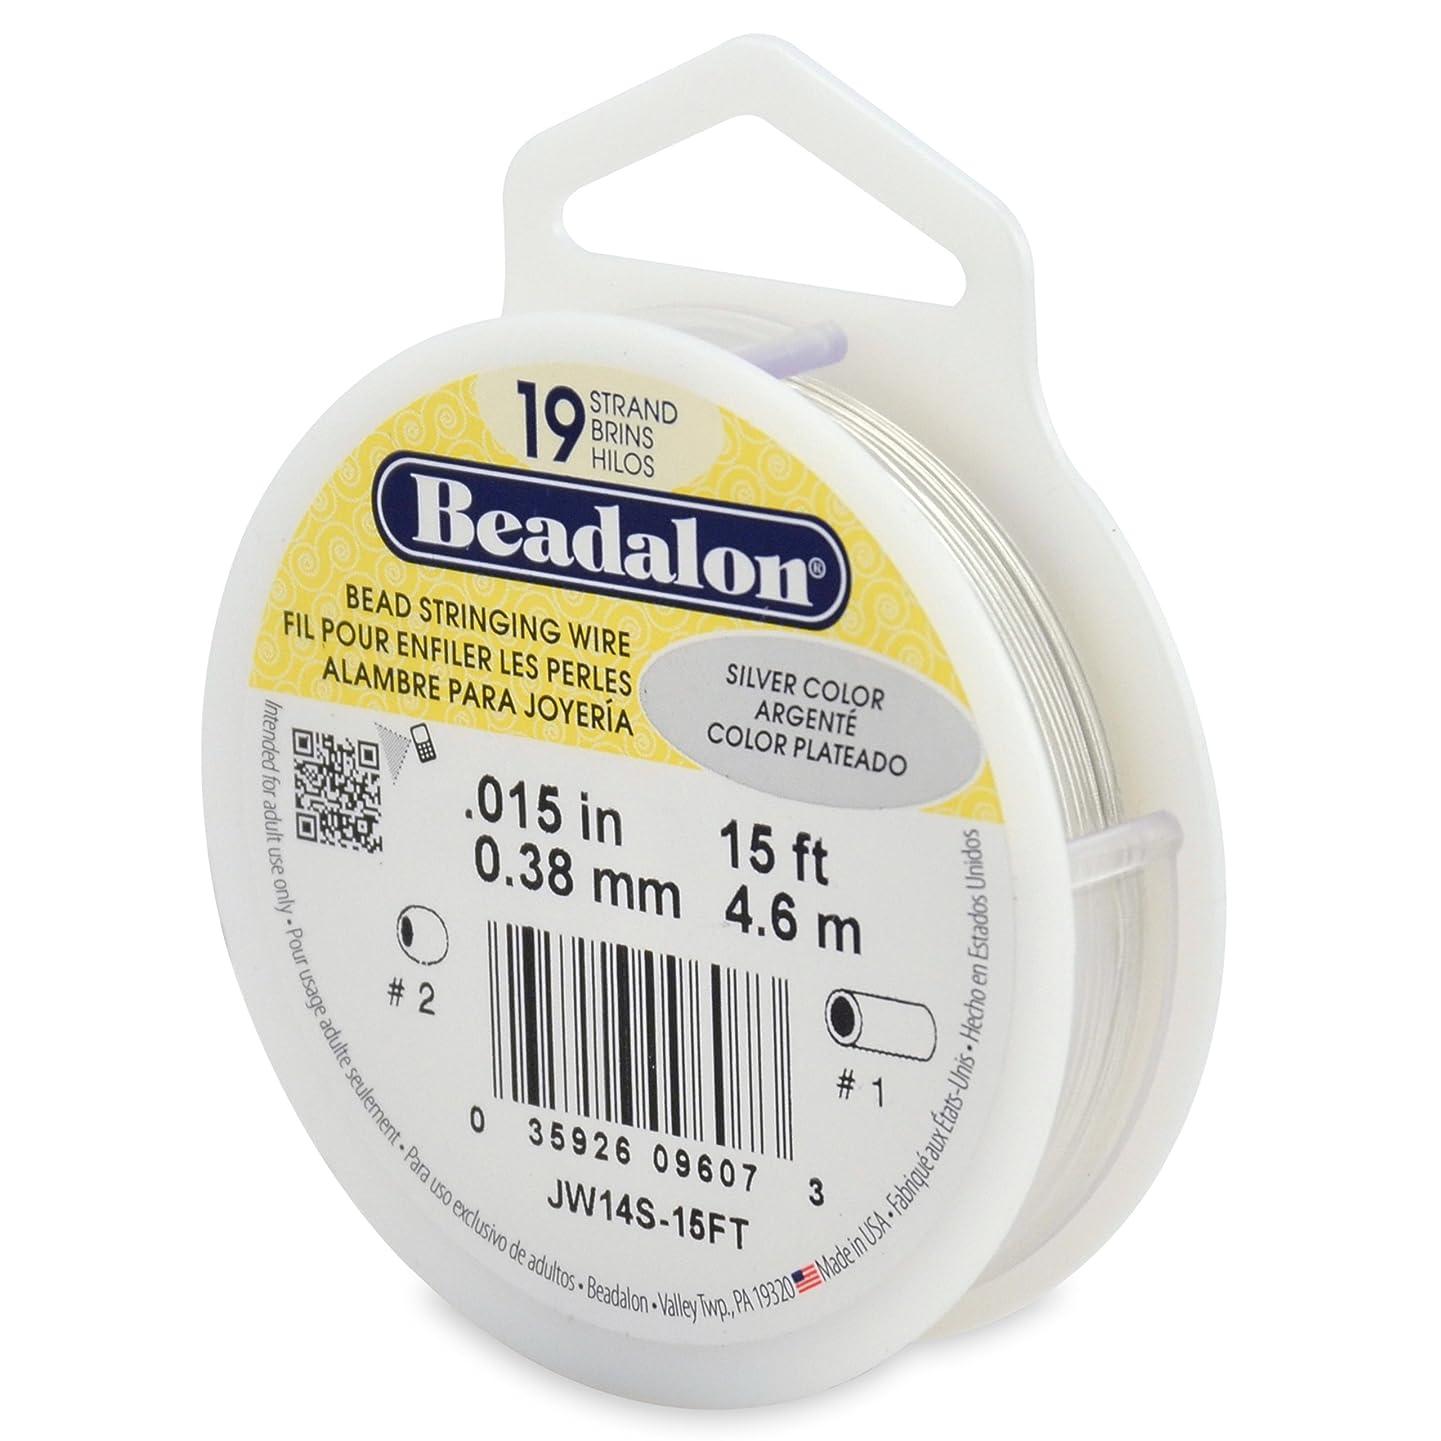 Beadalon 19-Strand Bead Stringing Wire, 0.015-Inch, Silver Color, 15-Feet